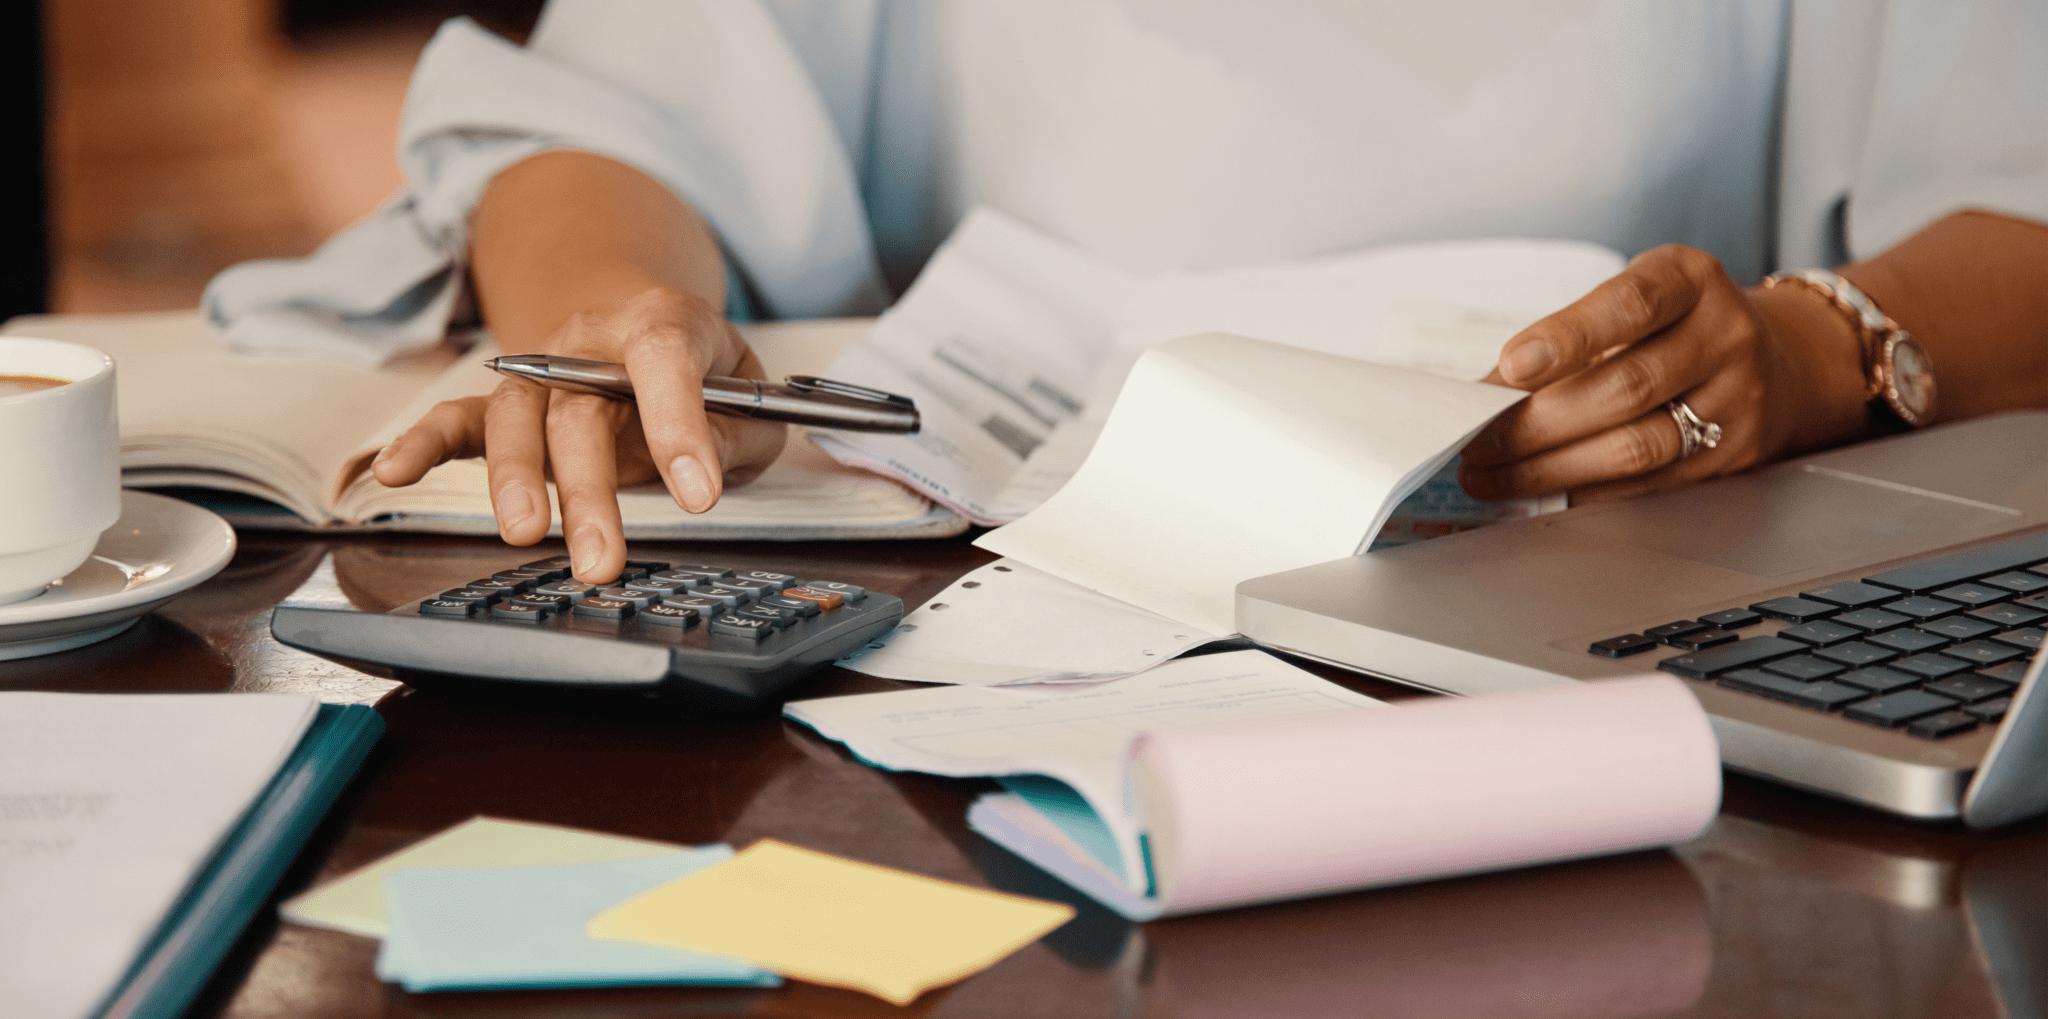 Rechnungsbearbeitung analog